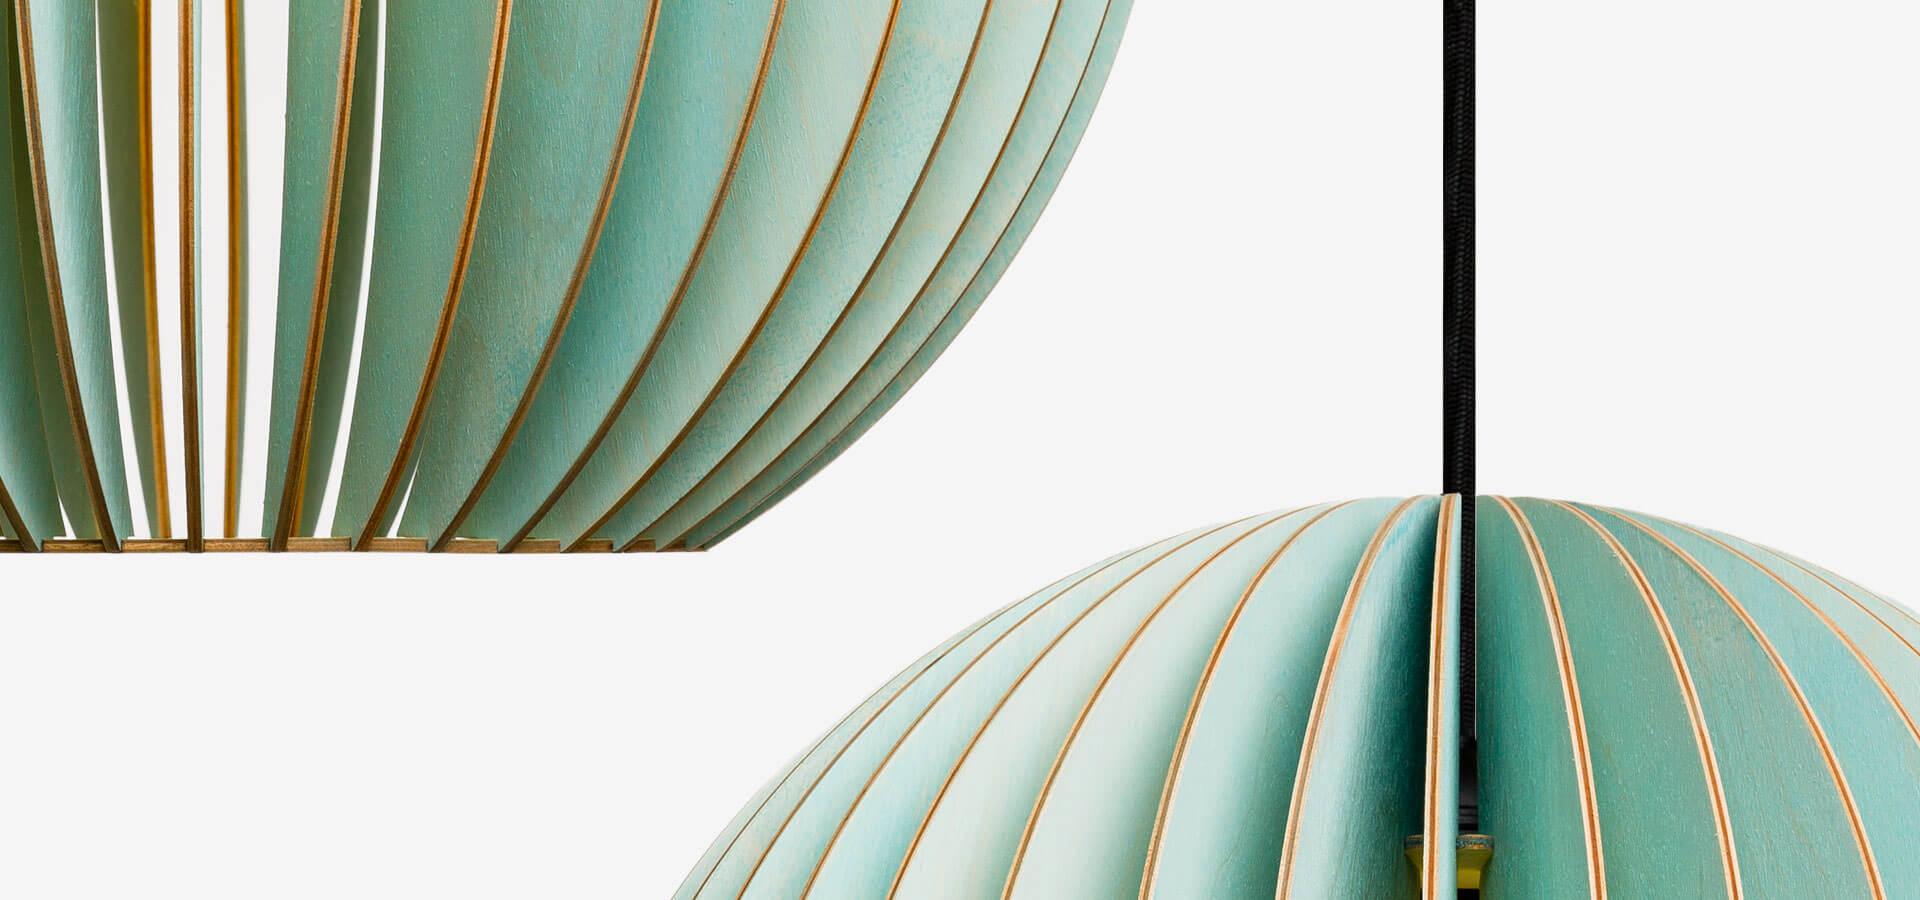 IUMI-DESIGN-LAMPEN-AUS-HOLZ-AION-BLAU2-1920×900